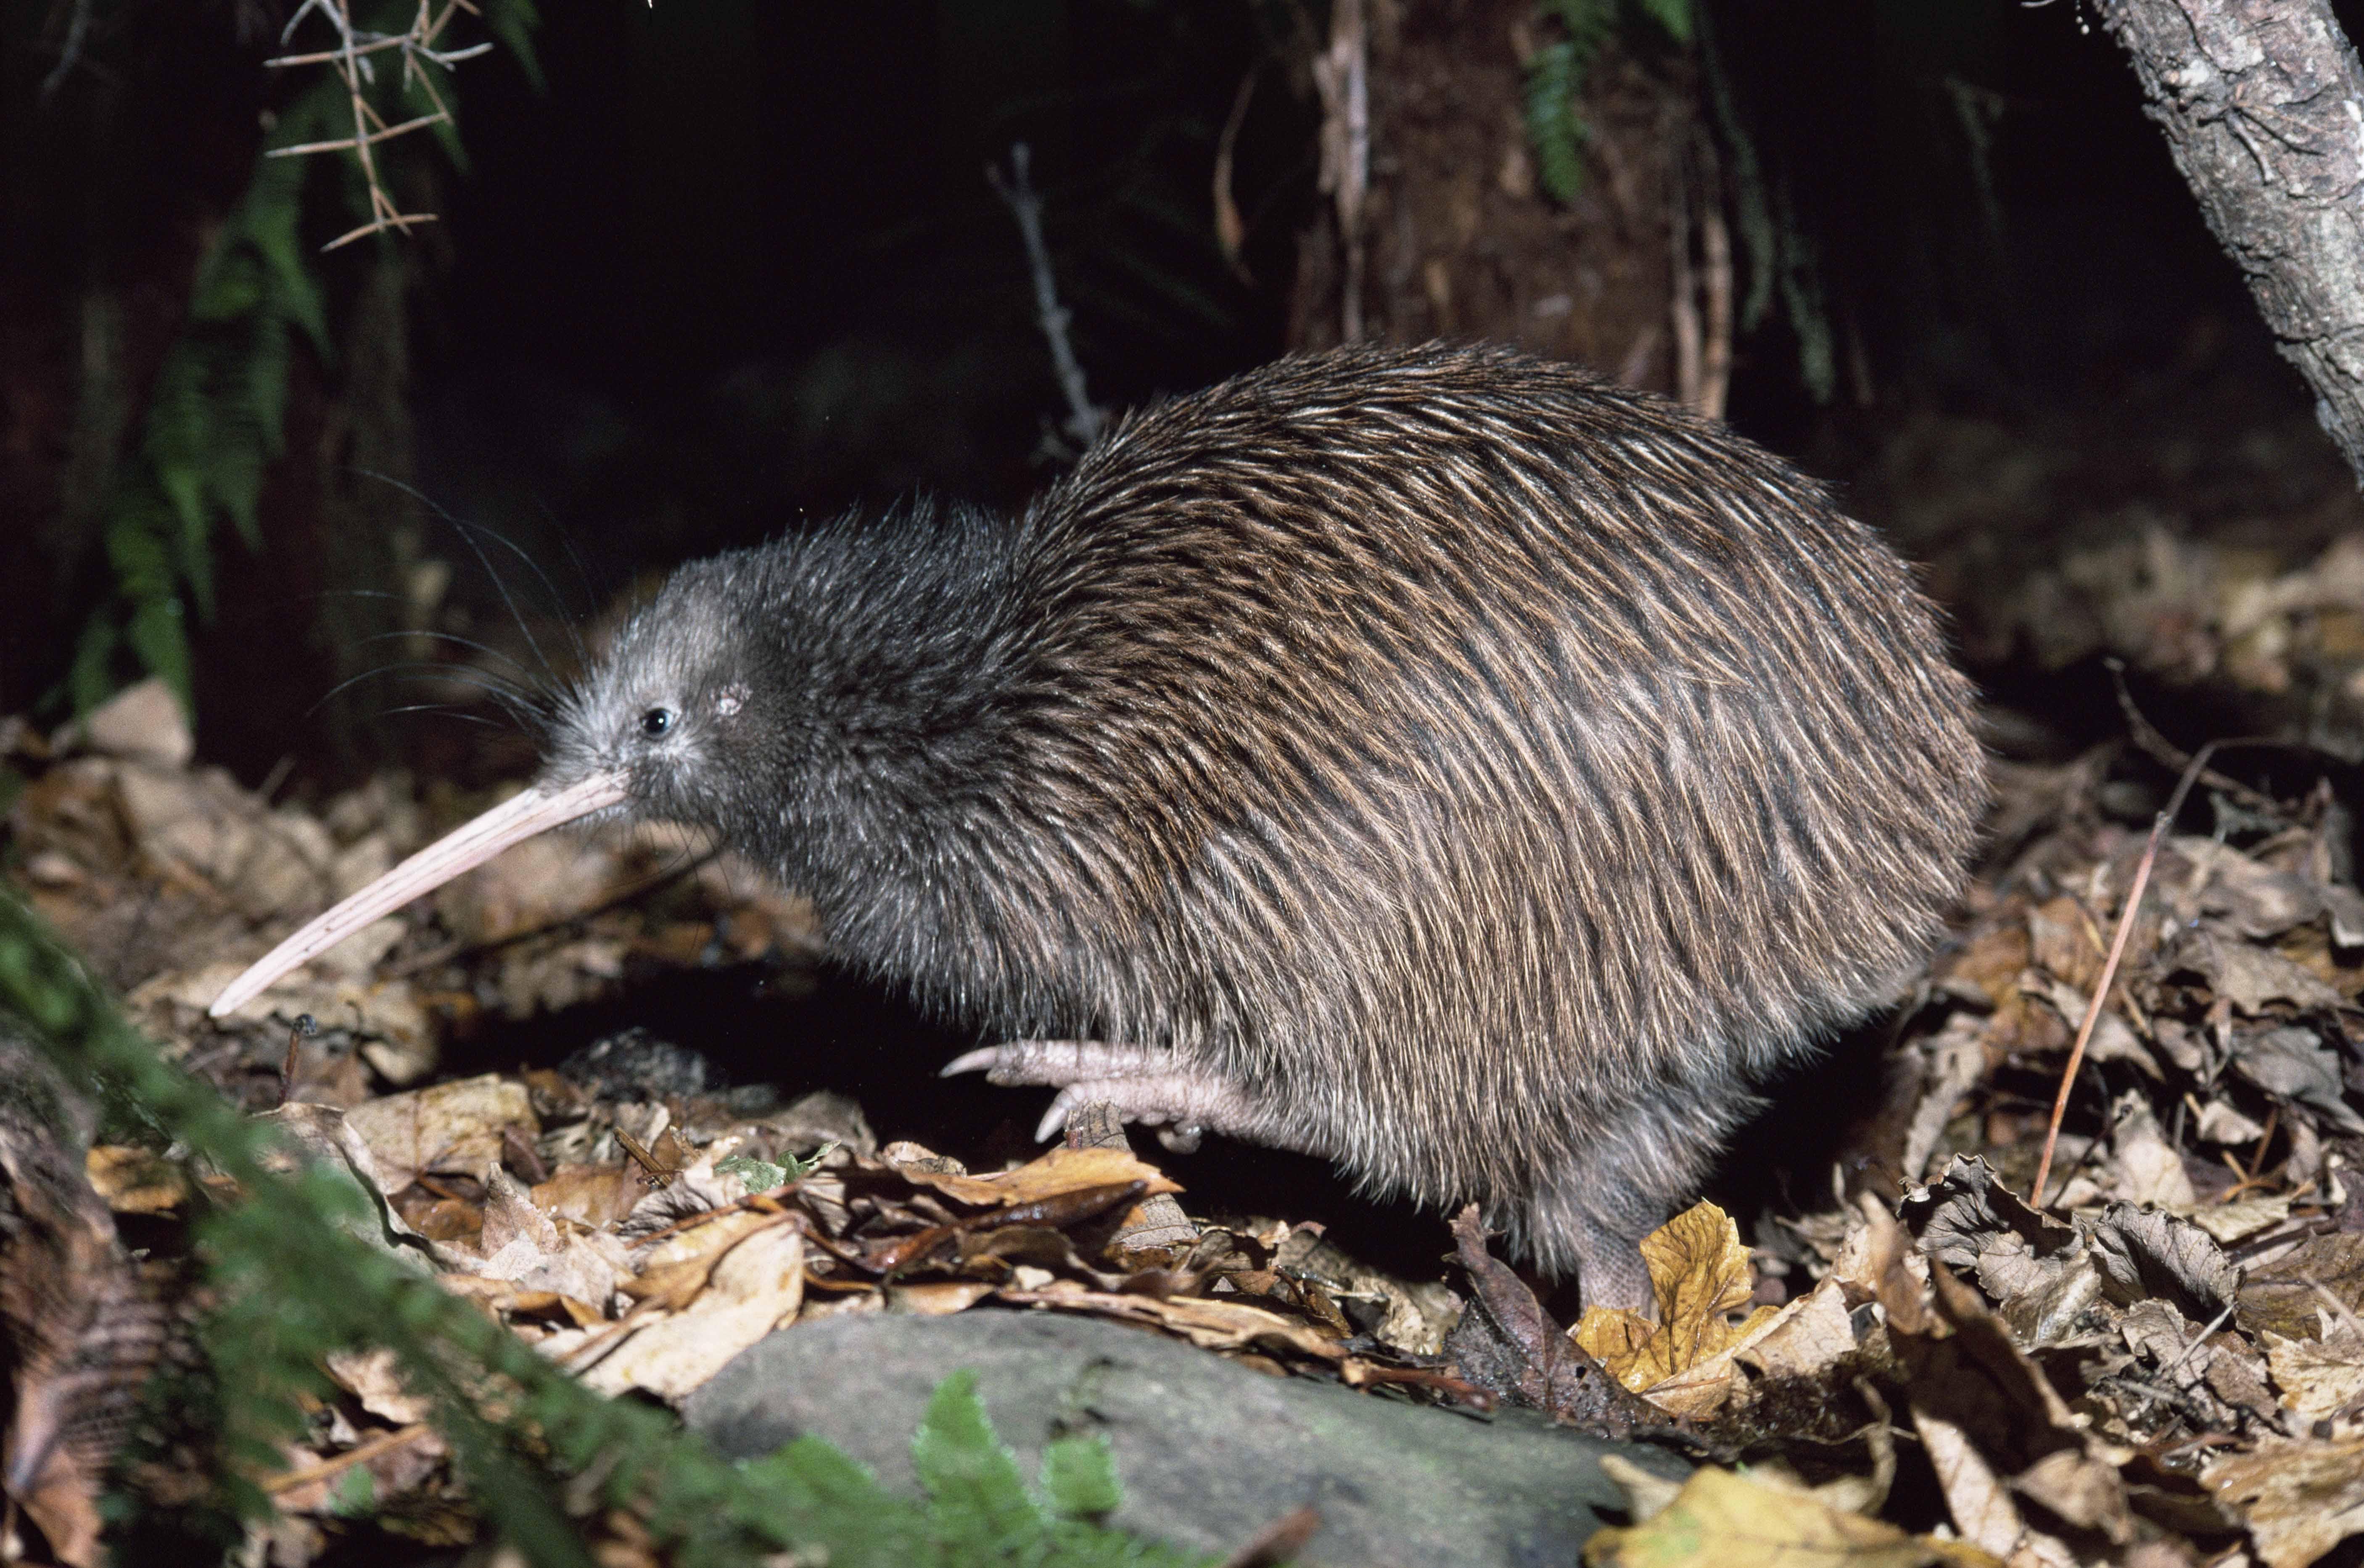 Stewart Island brown kiwi {Apteryx australis lawryi} Mason's Bay, New Zealand.